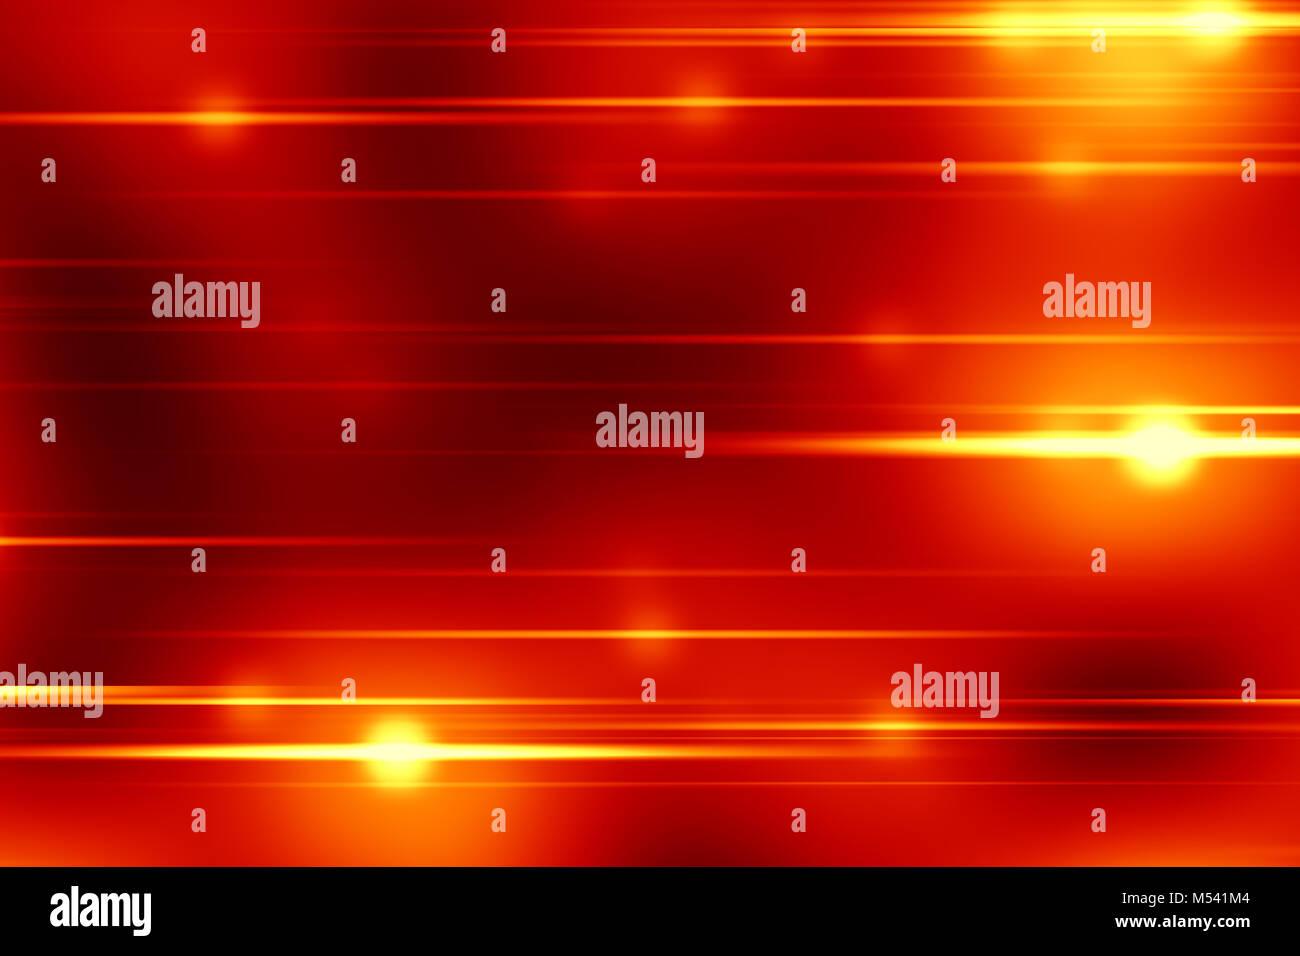 Red Christmas Light Streaks Background Stock Photo